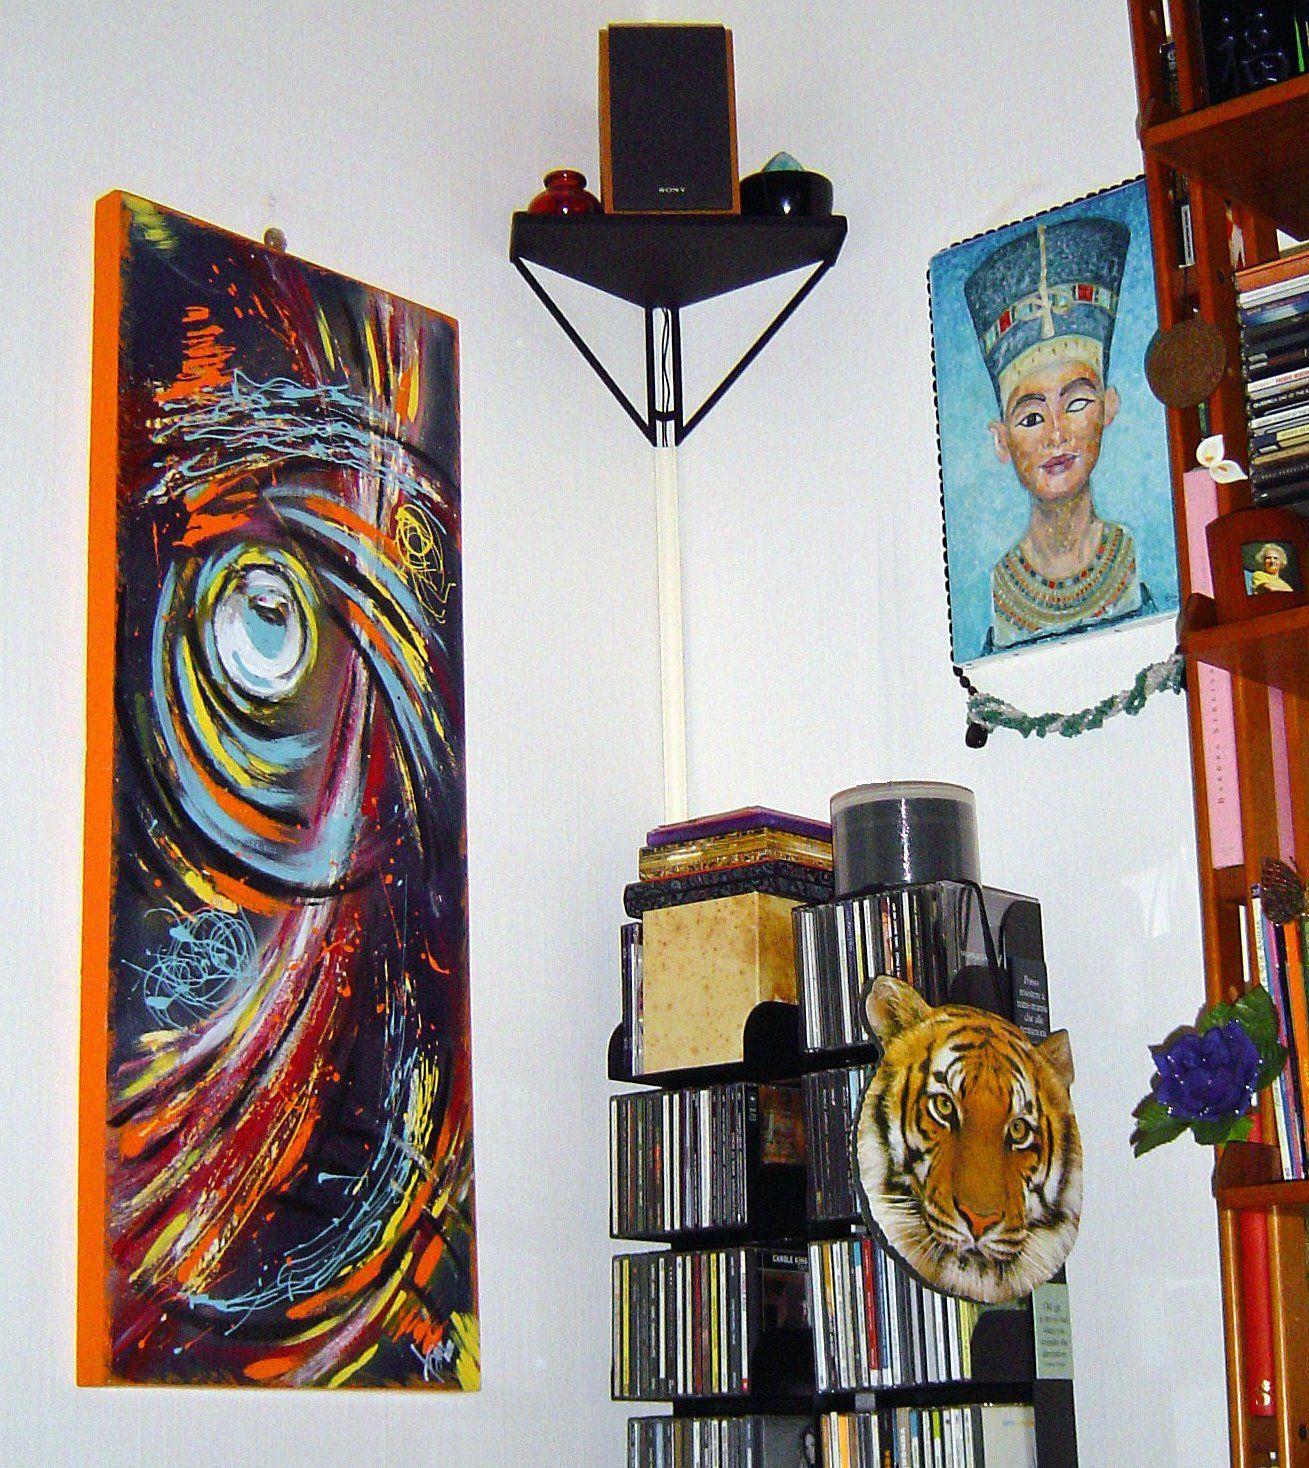 Schizzi #handamde #art #home #paint